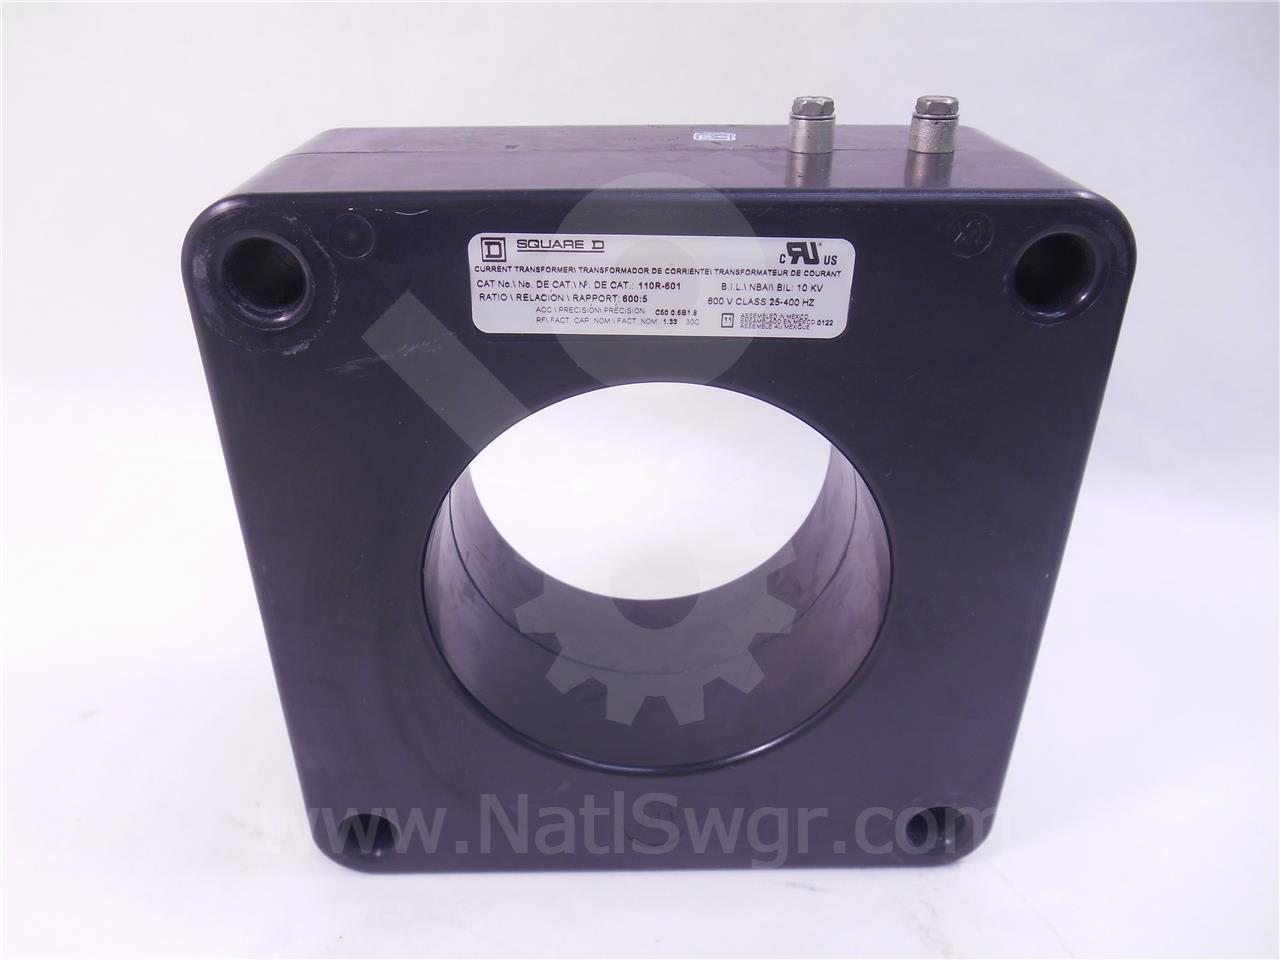 110R-601 Square D CURRENT TRANSFORMER 600:5 600A, 600V, 10KV BIL C50